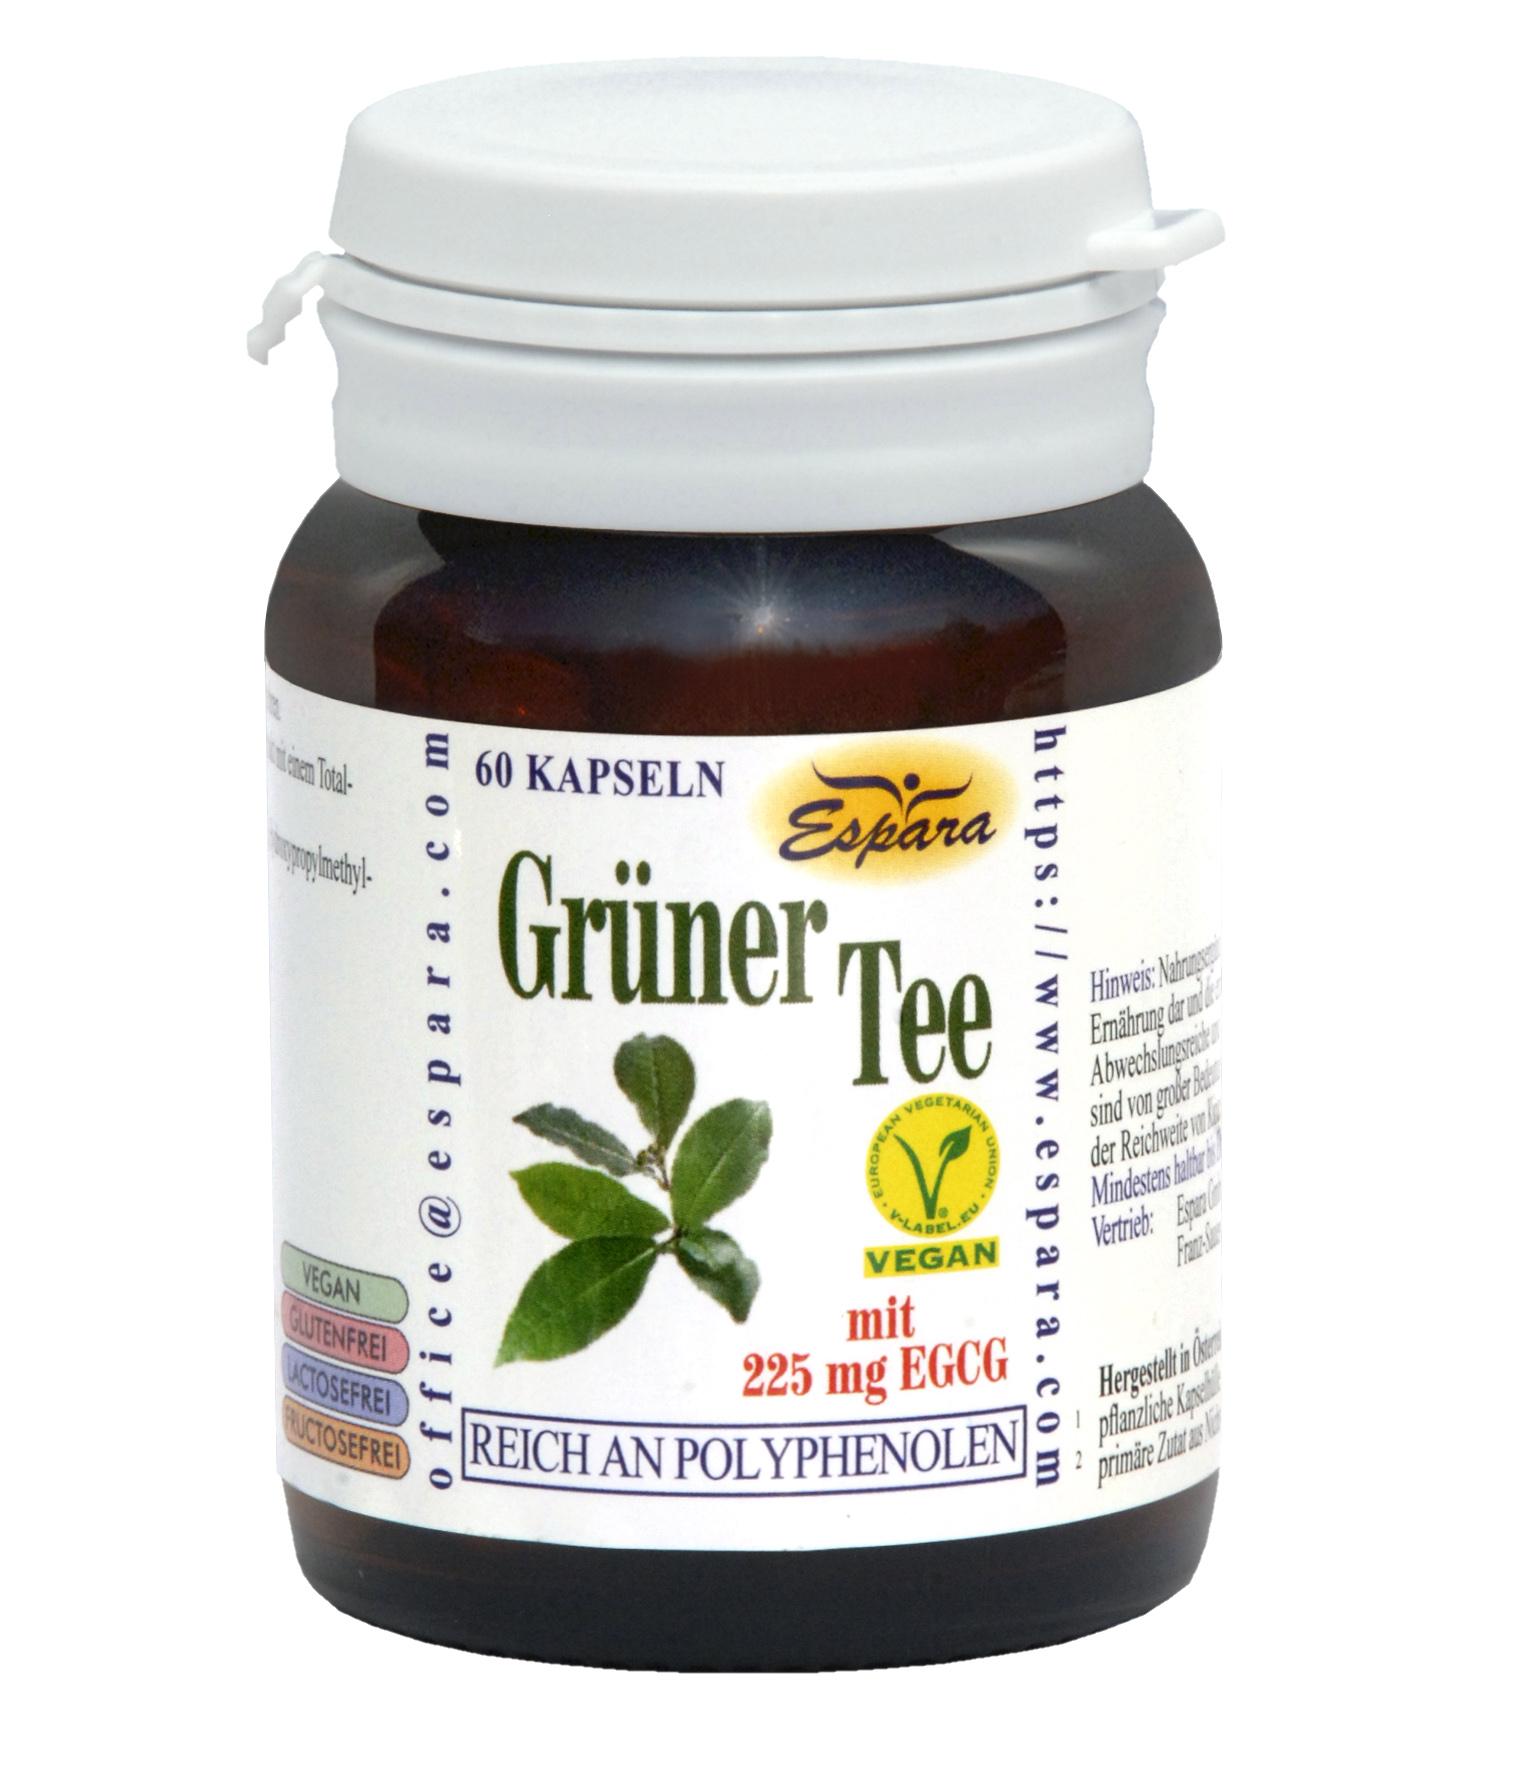 Espara Grüner Tee Kapseln